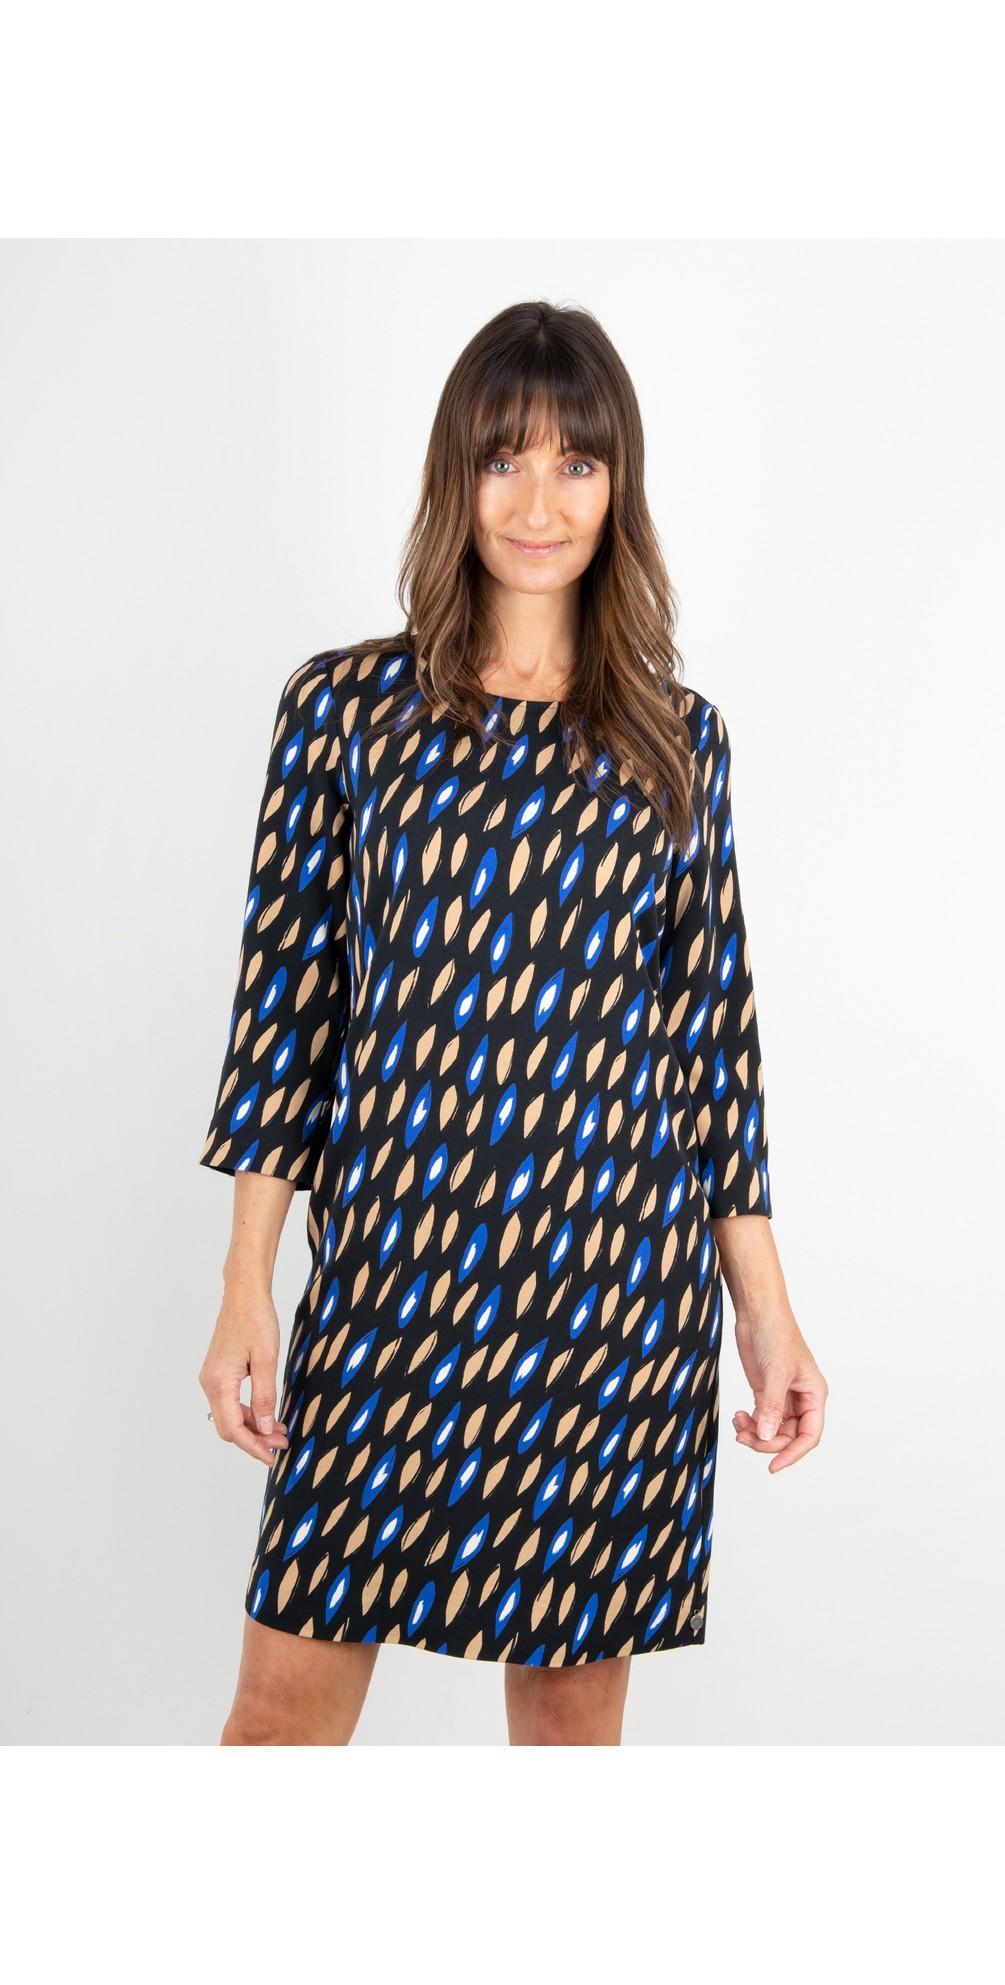 Abstract Geometric Print Dress main image